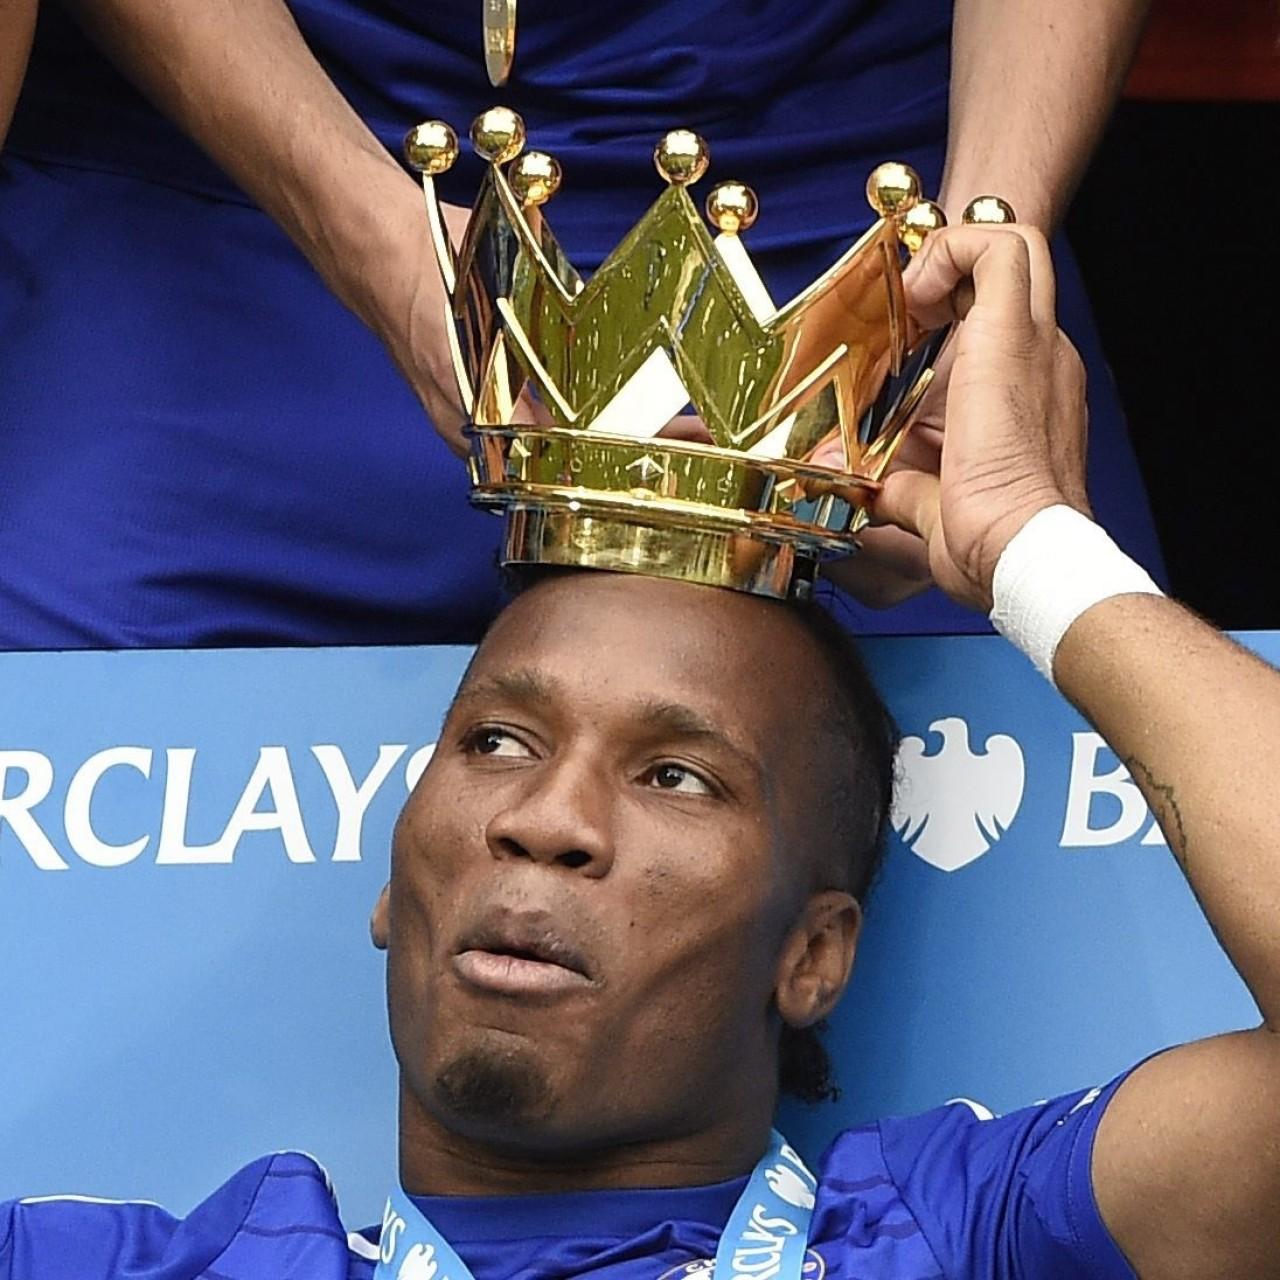 Didier Drogba backs 'Save Hakeem' campaign as football matches